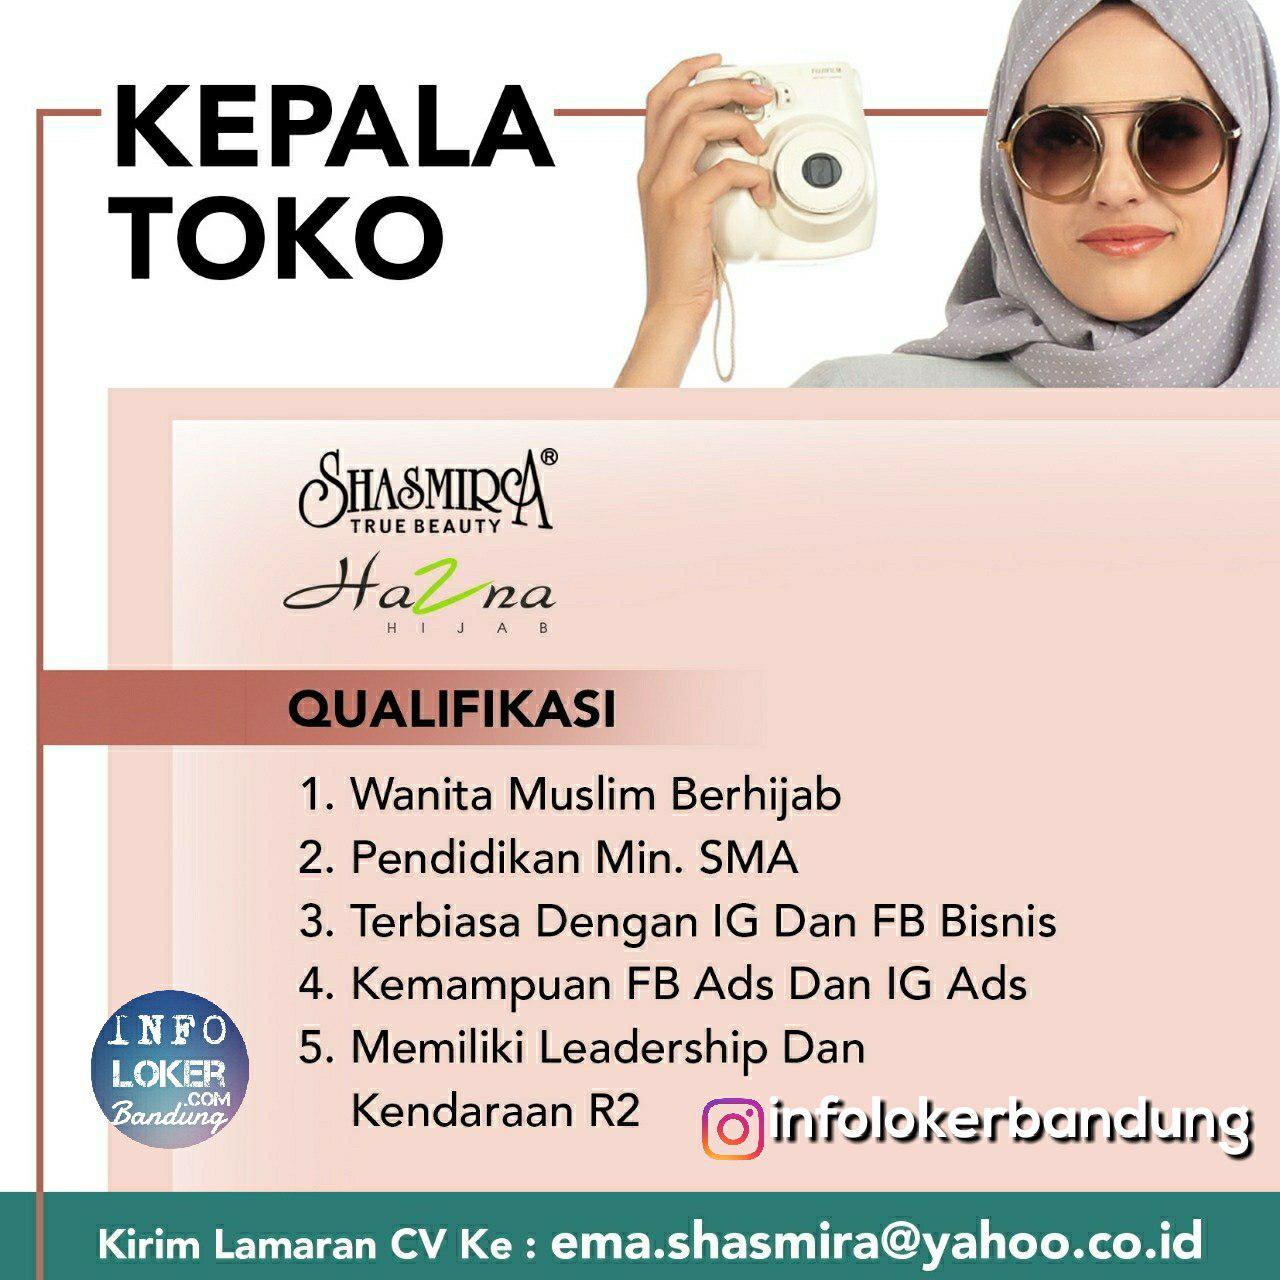 Lowongan Kerja Kepala Toko Shasmira Bandung November 2018